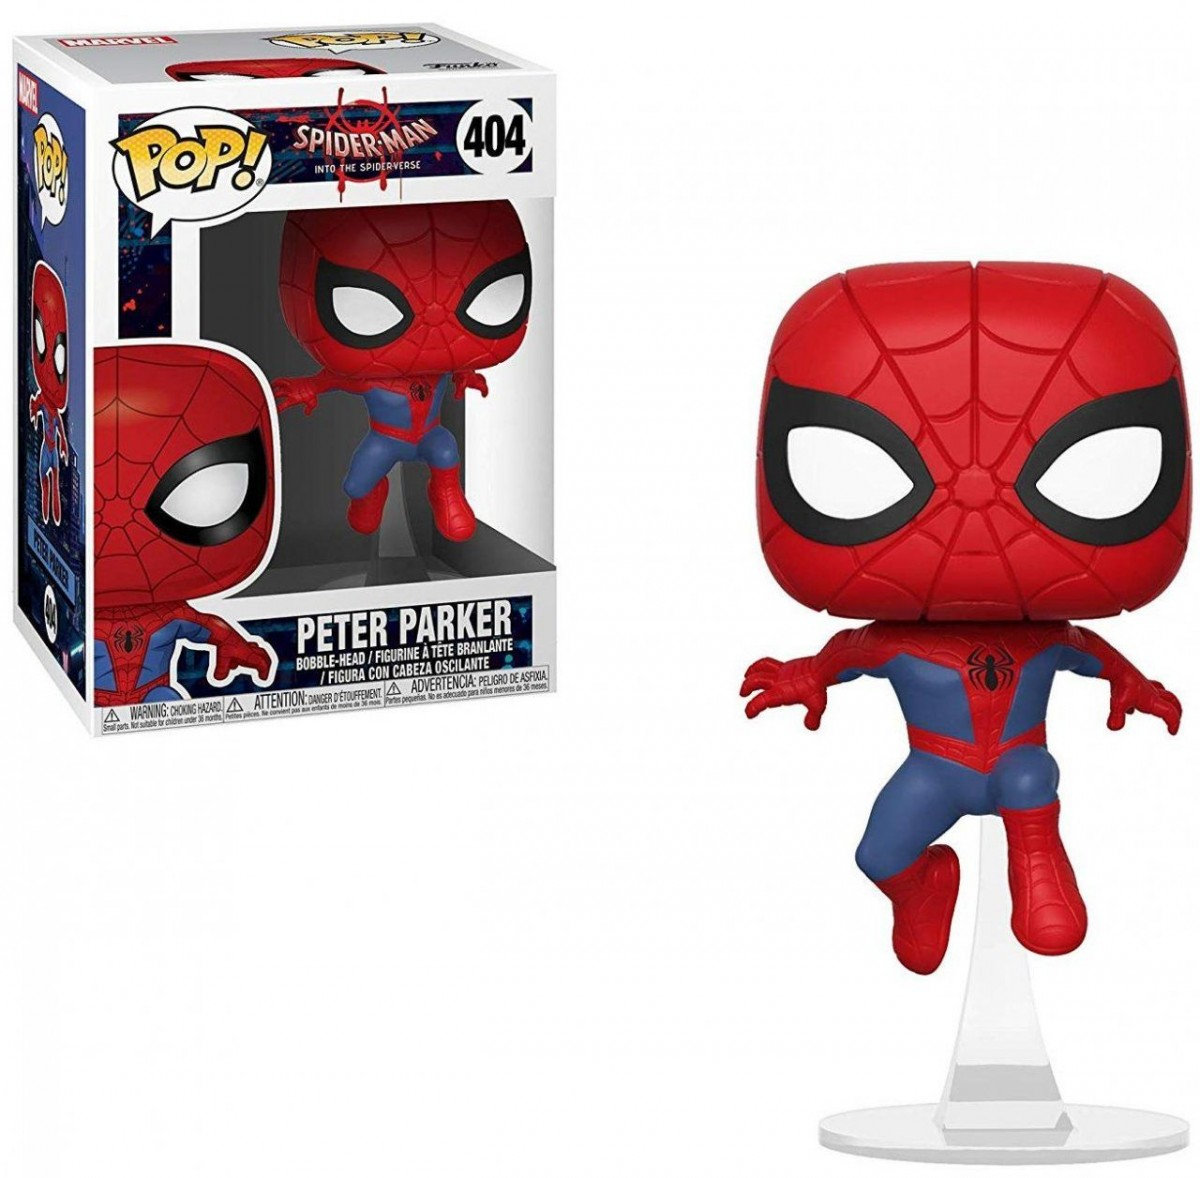 Фигурка Funko POP! Bobble: Человек-паук (Spider-Man) Человек-паук: Через вселенные (Animated Spider-Man) (34755) 9,5 см